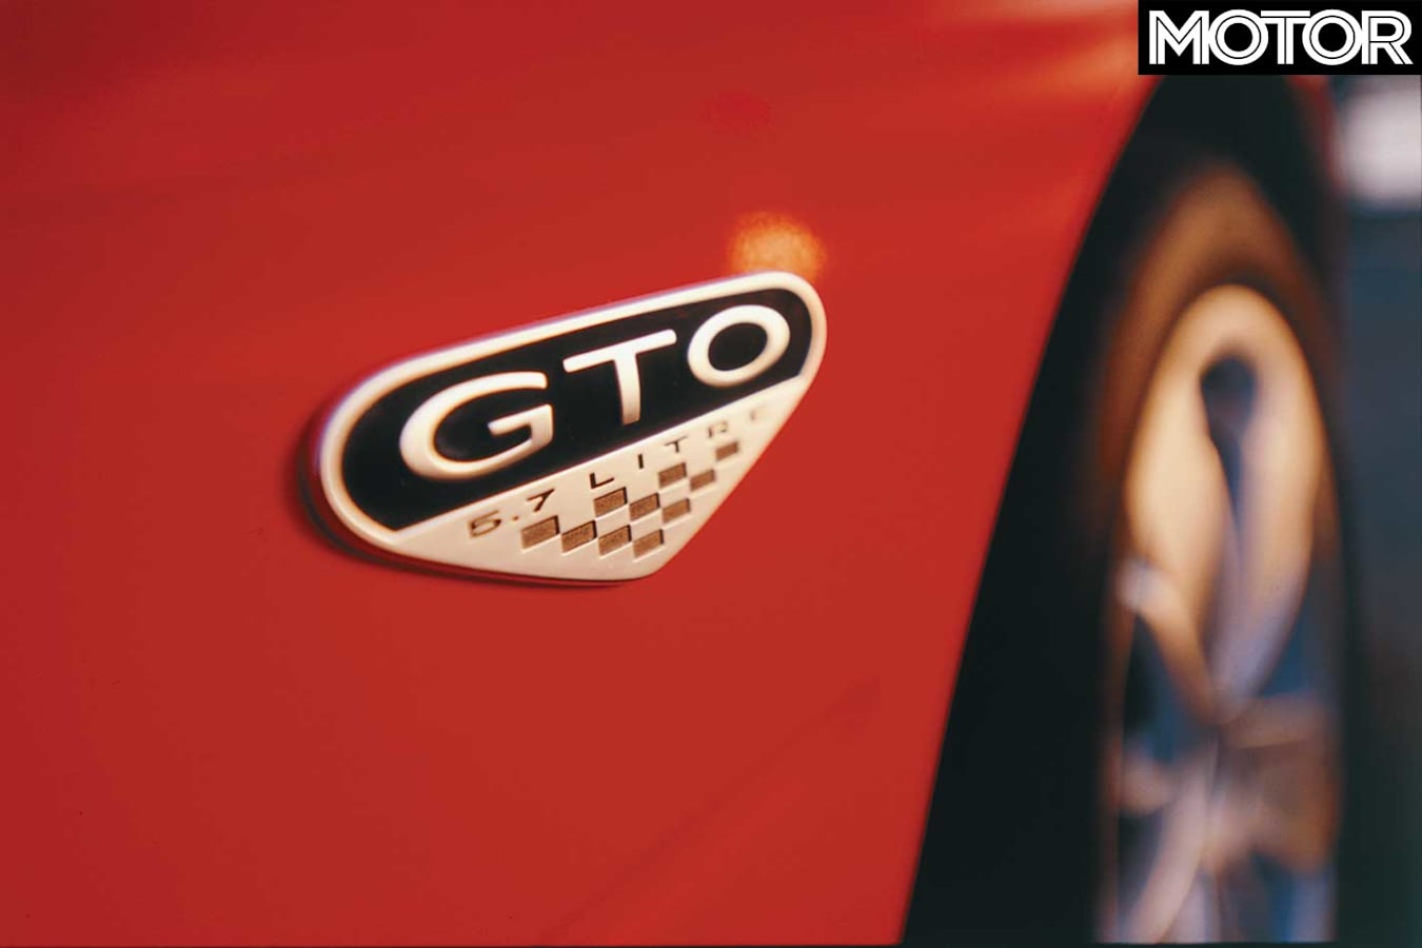 2004 Pontiac GTO Badge Jpg